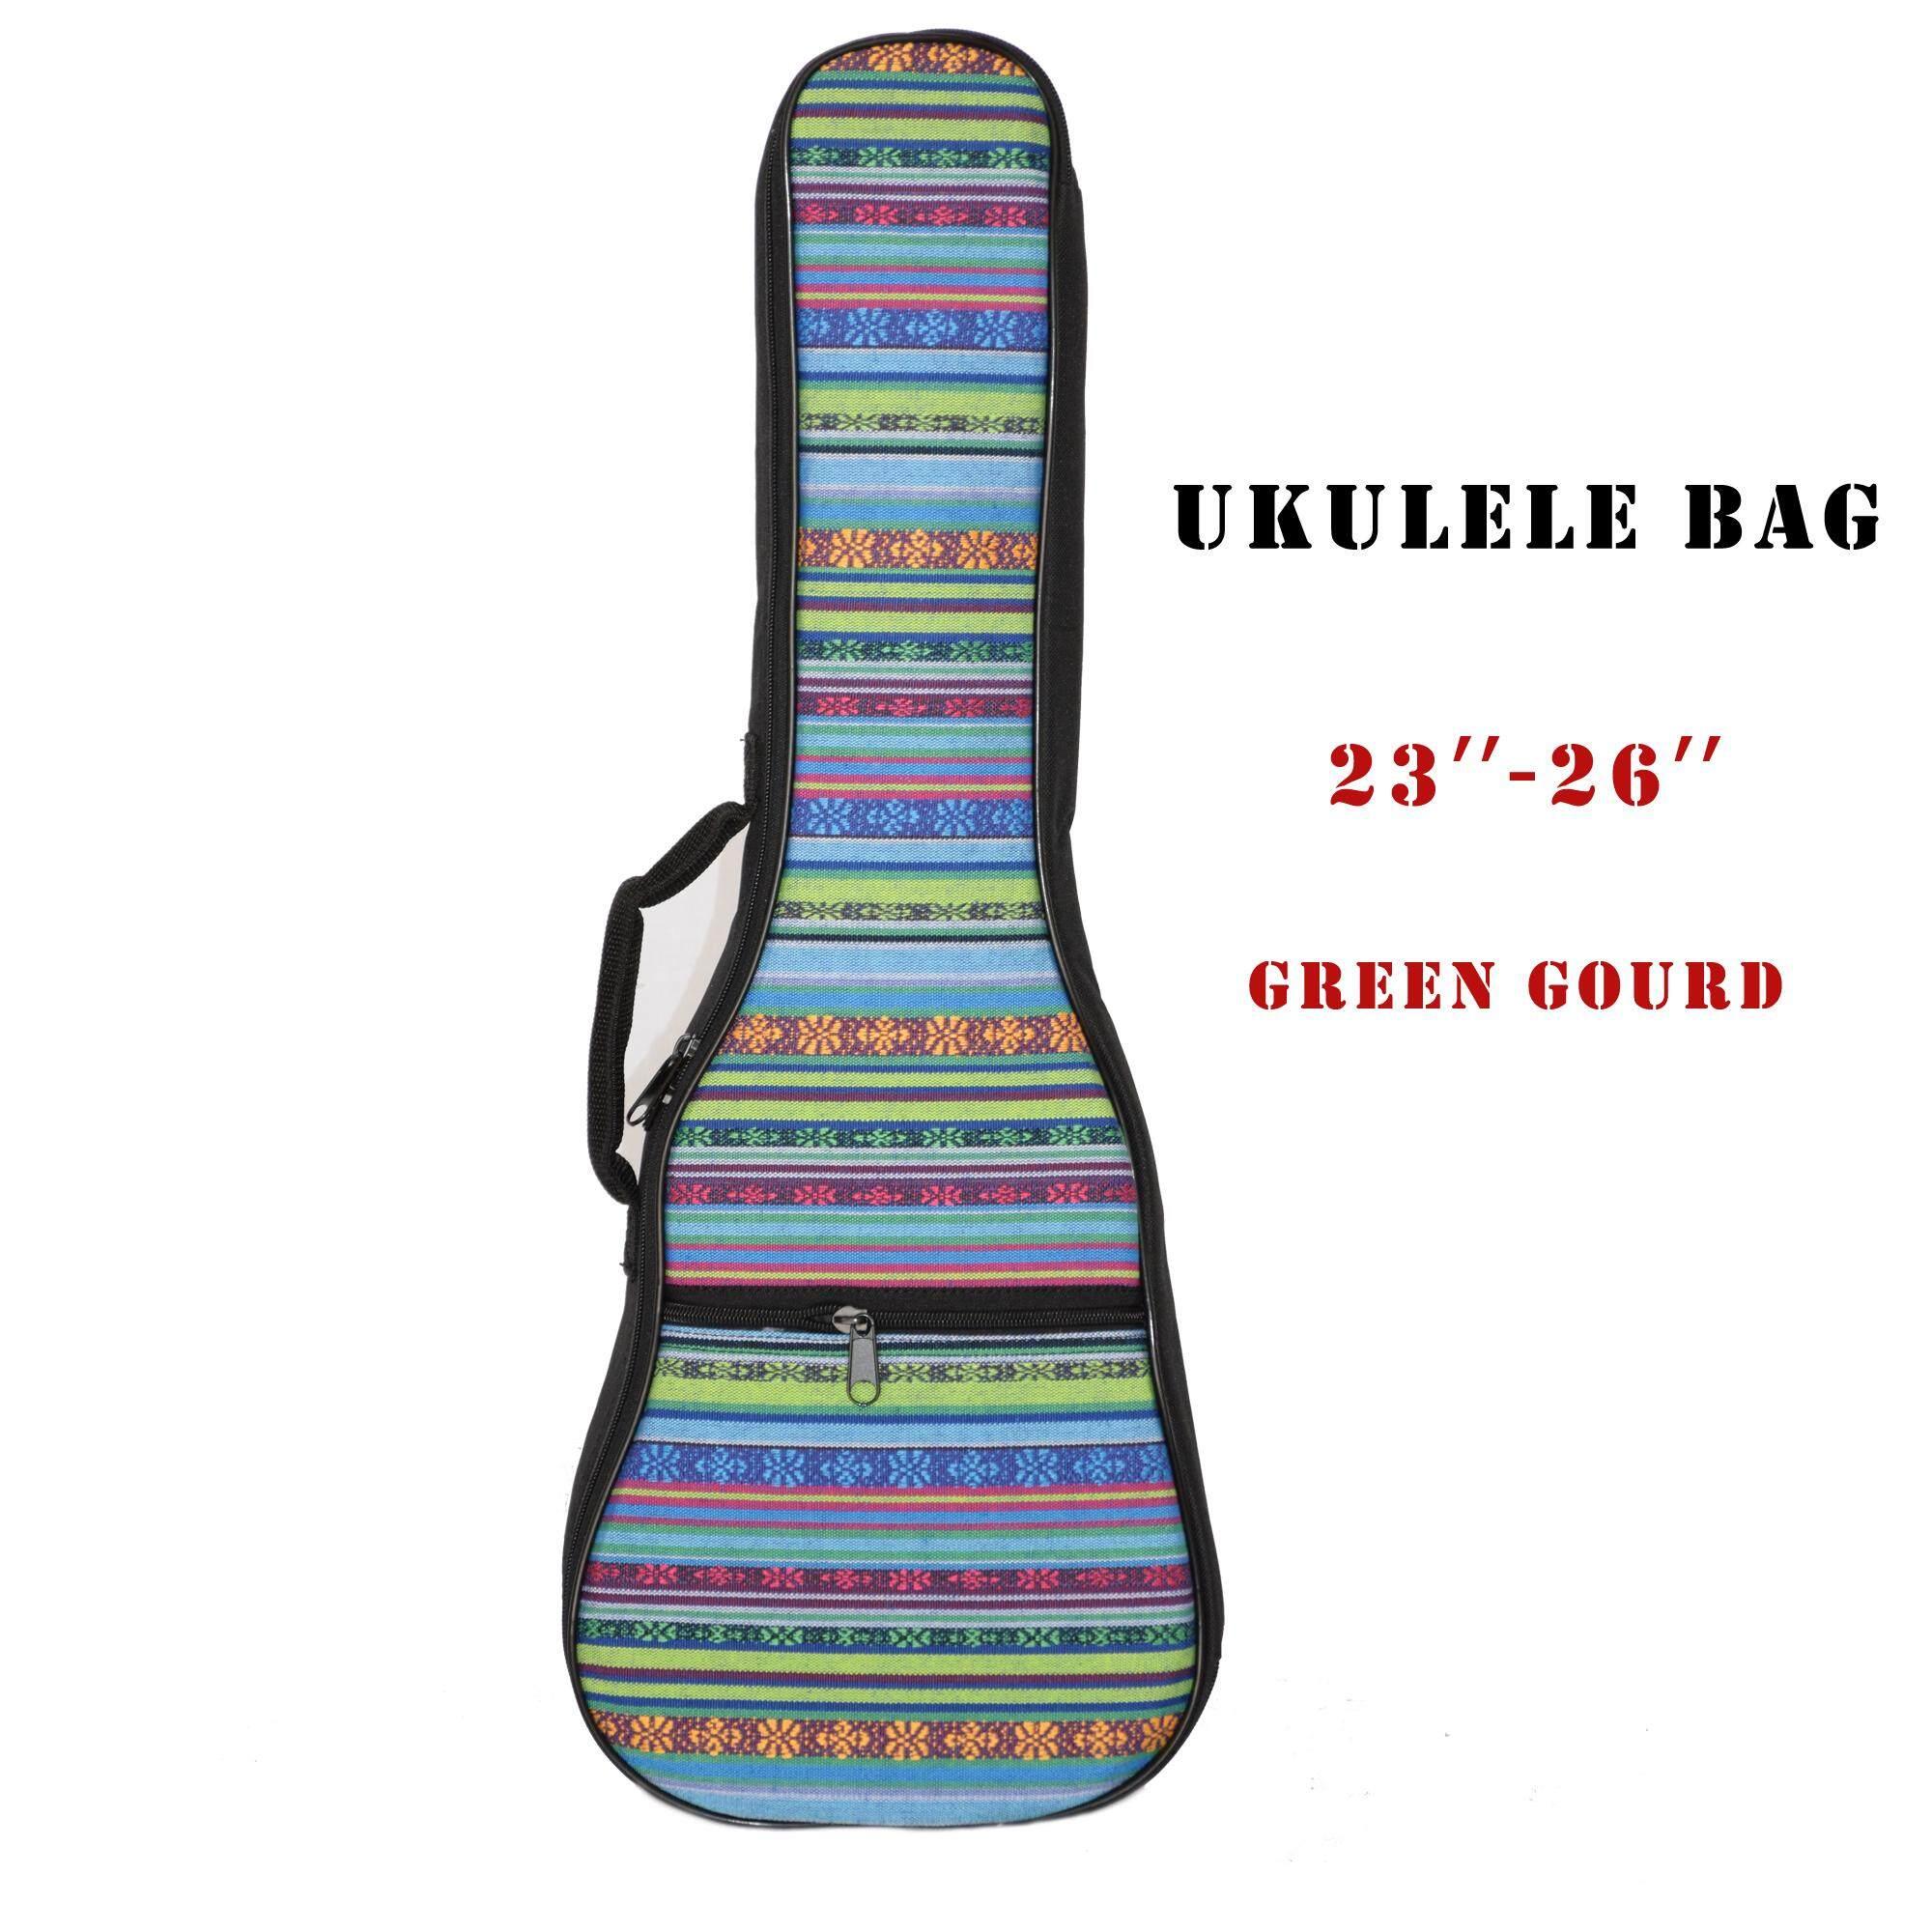 Ukulele Bag Usa Pro Ukulele Concert Bag กระเป๋า อูคูเลเล่ พิมพ์ลาย Ukulele Concet คอนเสิต 23-26 นิ้ว กันน้ำ อย่างดี By Happykids.